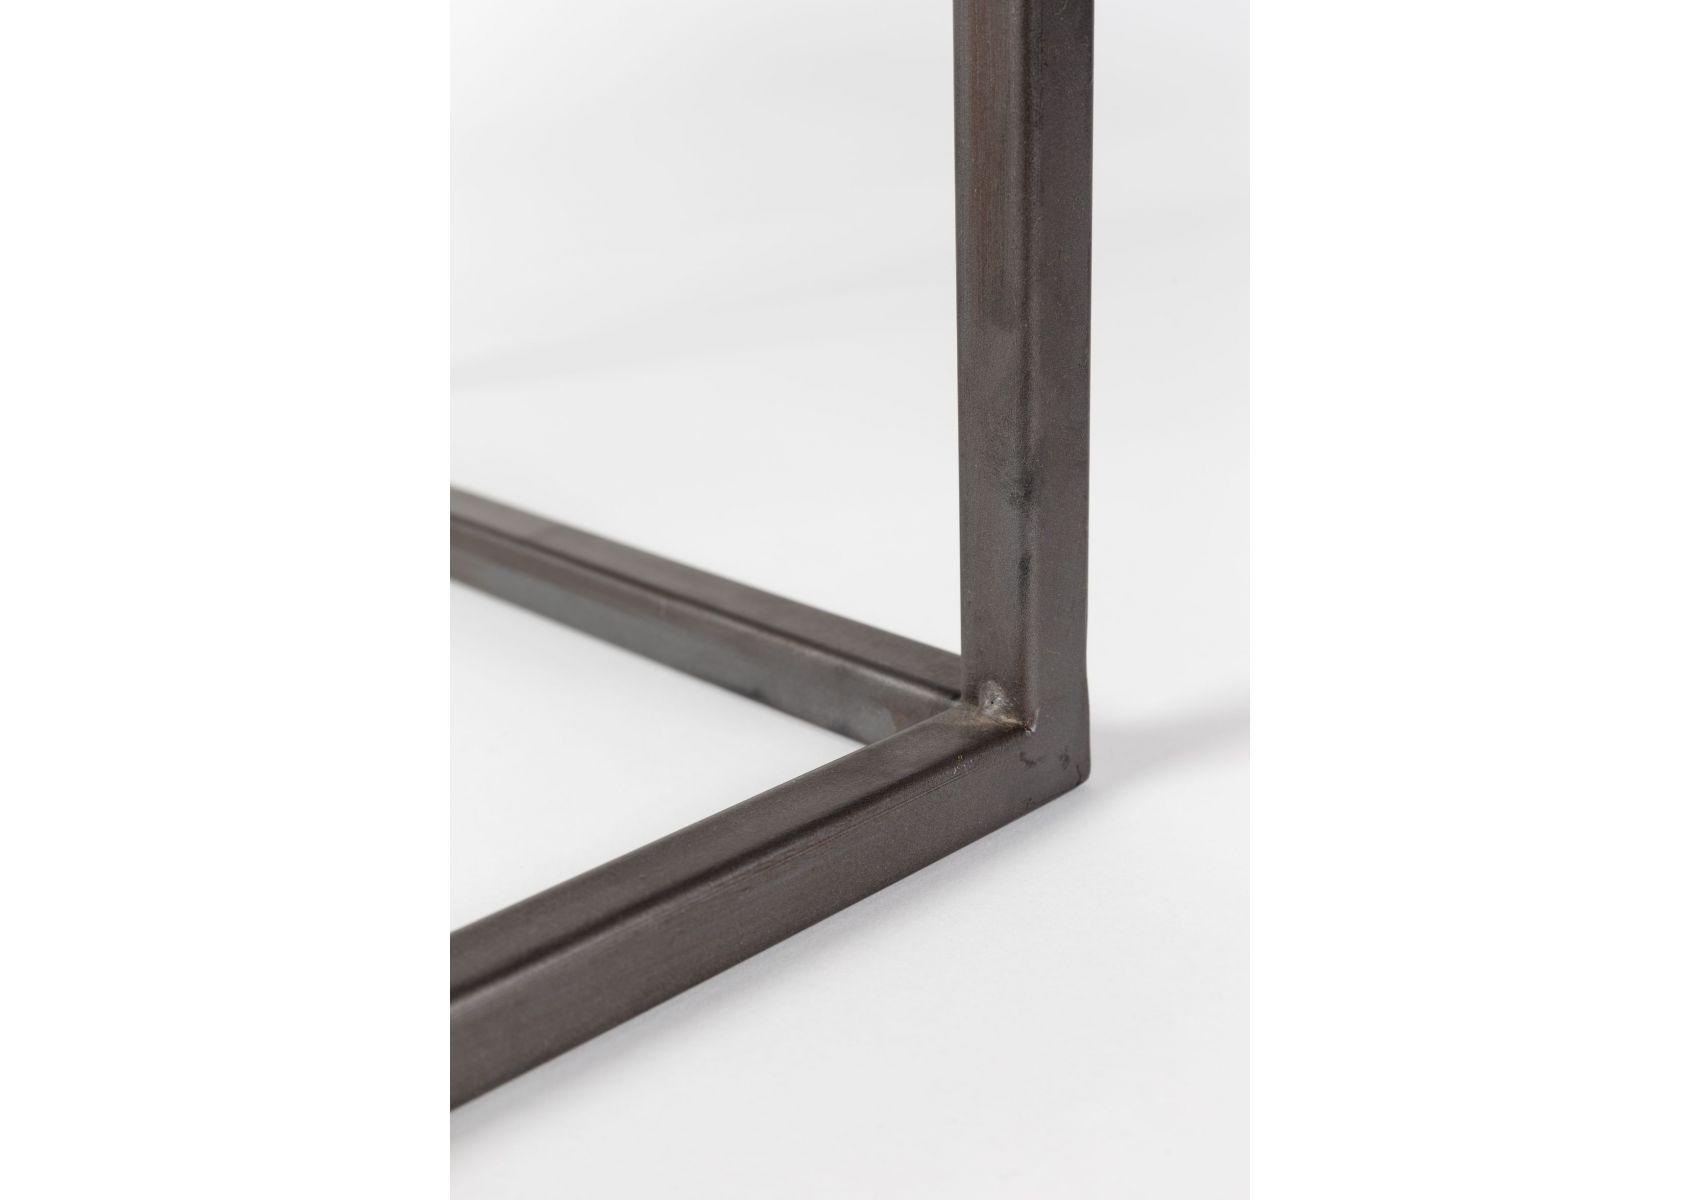 table basse gigogne industrielle bois et m tal joy boite design. Black Bedroom Furniture Sets. Home Design Ideas